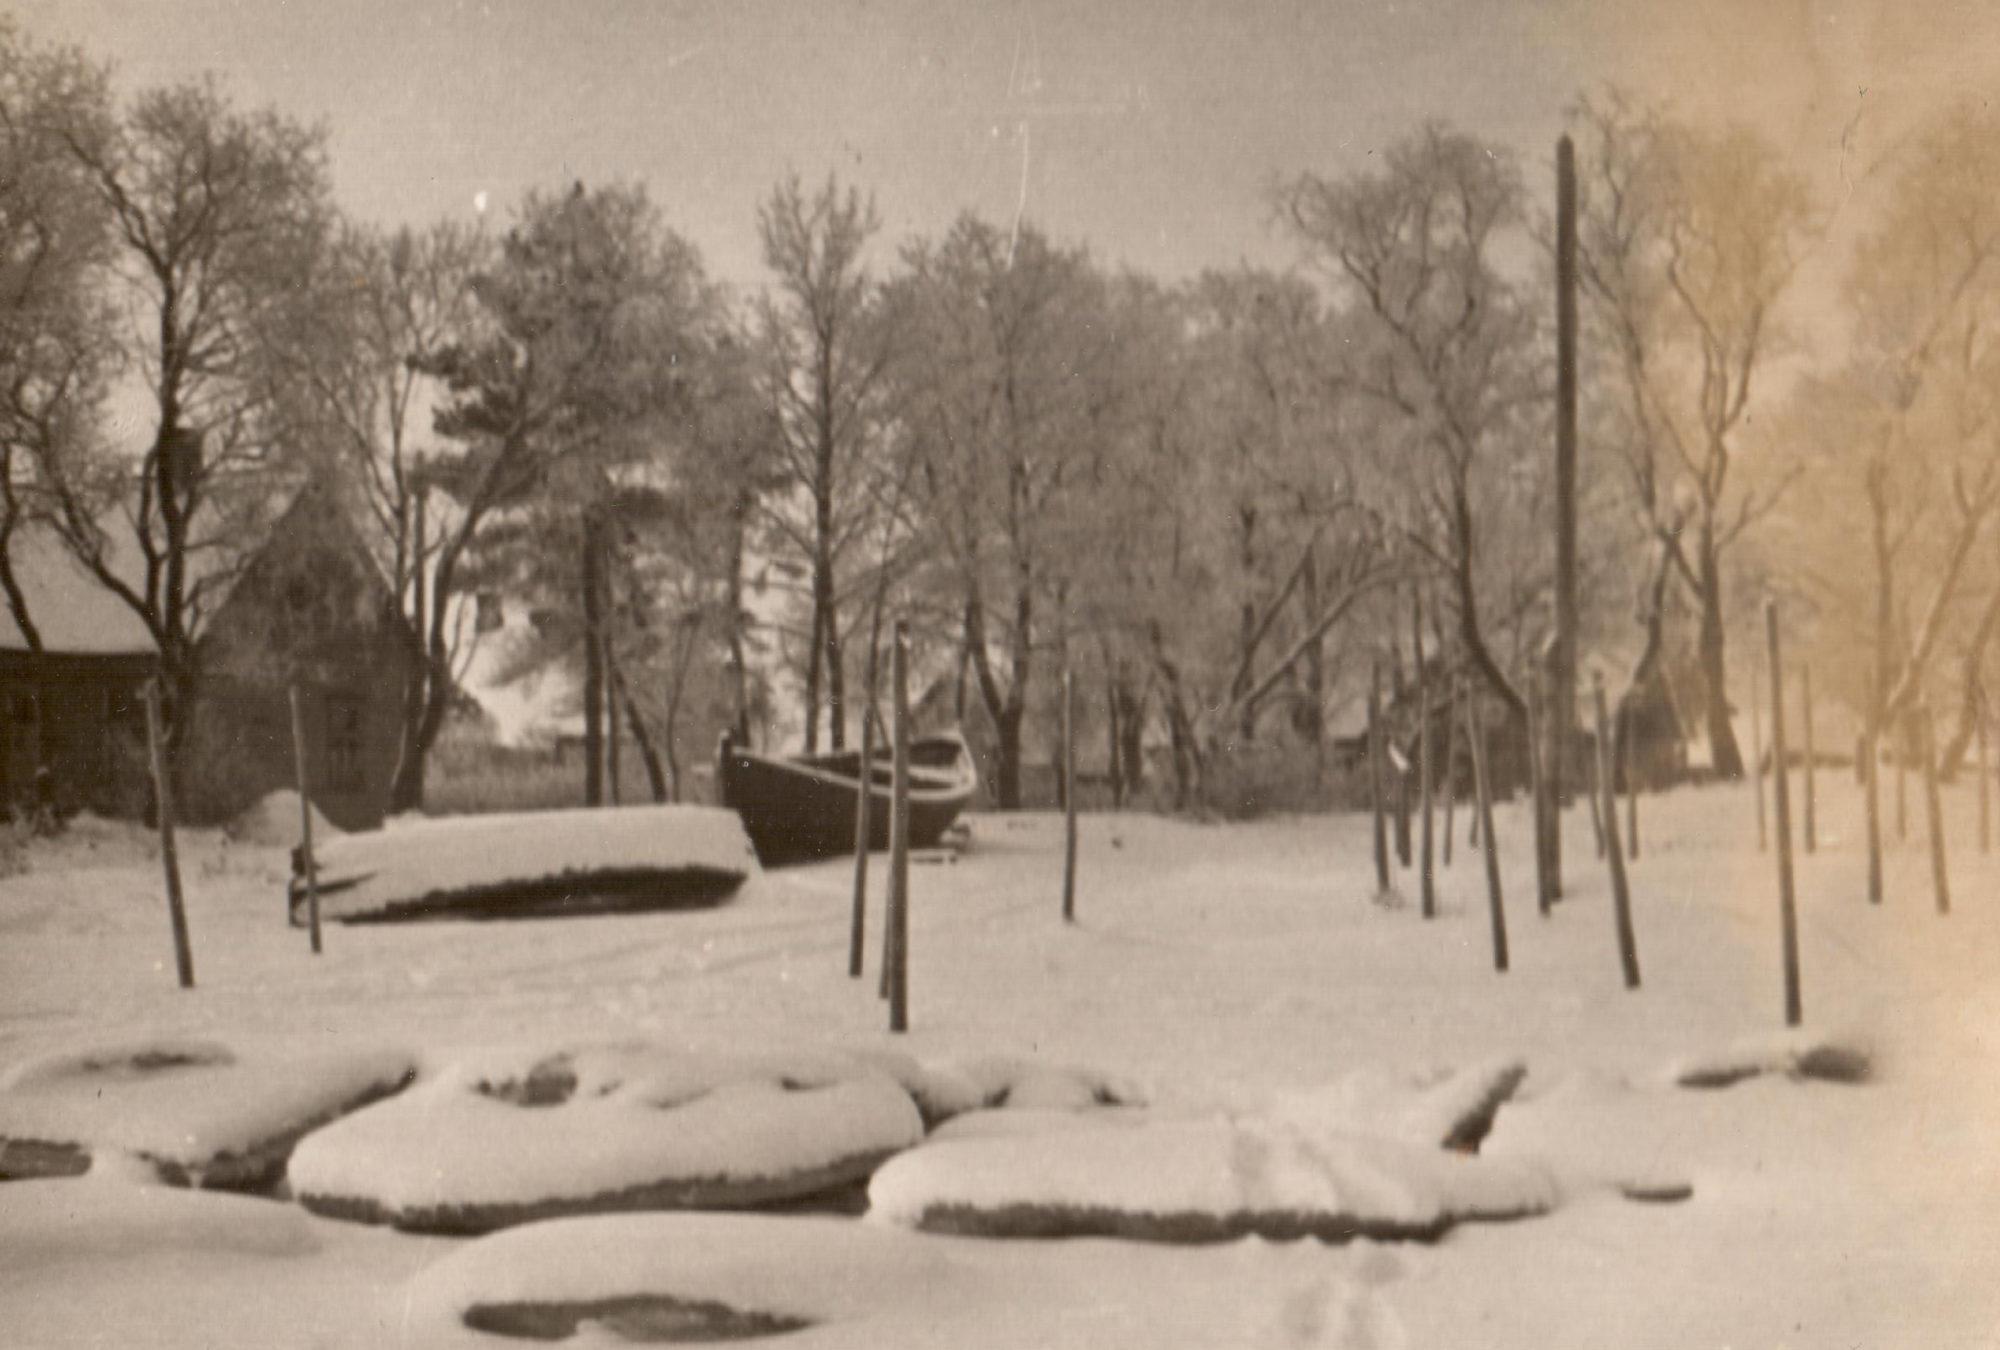 The property of Alberti, winter of 1942.